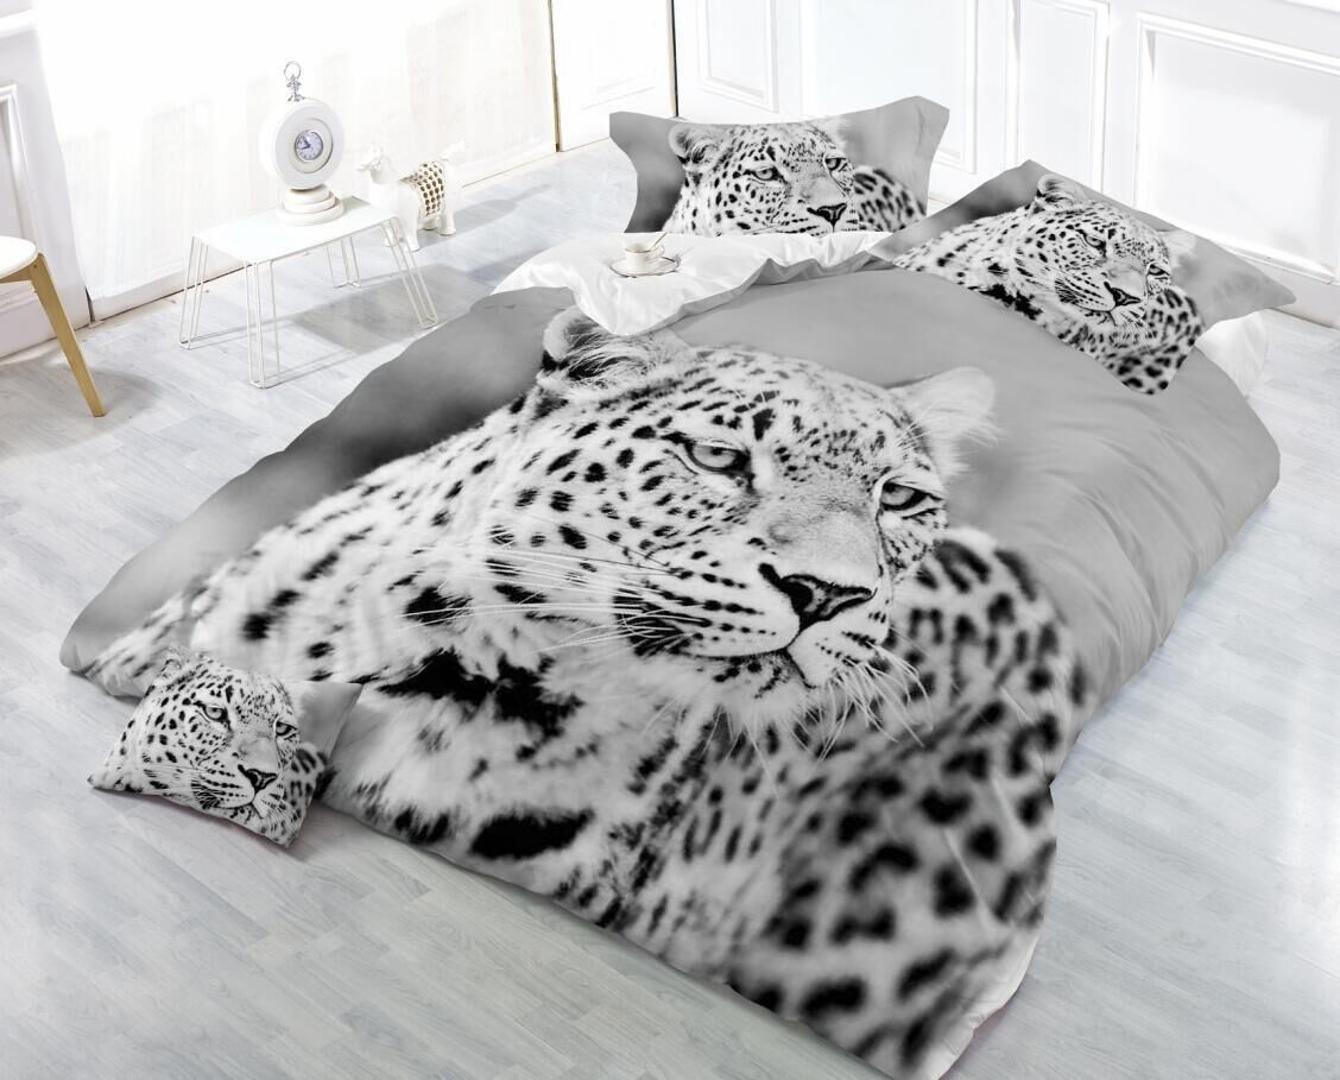 King Size Bedroom Comforter Set New 3d Leopard Cat Grain Bedding Set forter Duvet Cover Bed Sheet Pillowcases King Size Bed Linen Home Decor Christmas Bedding King forter Blue